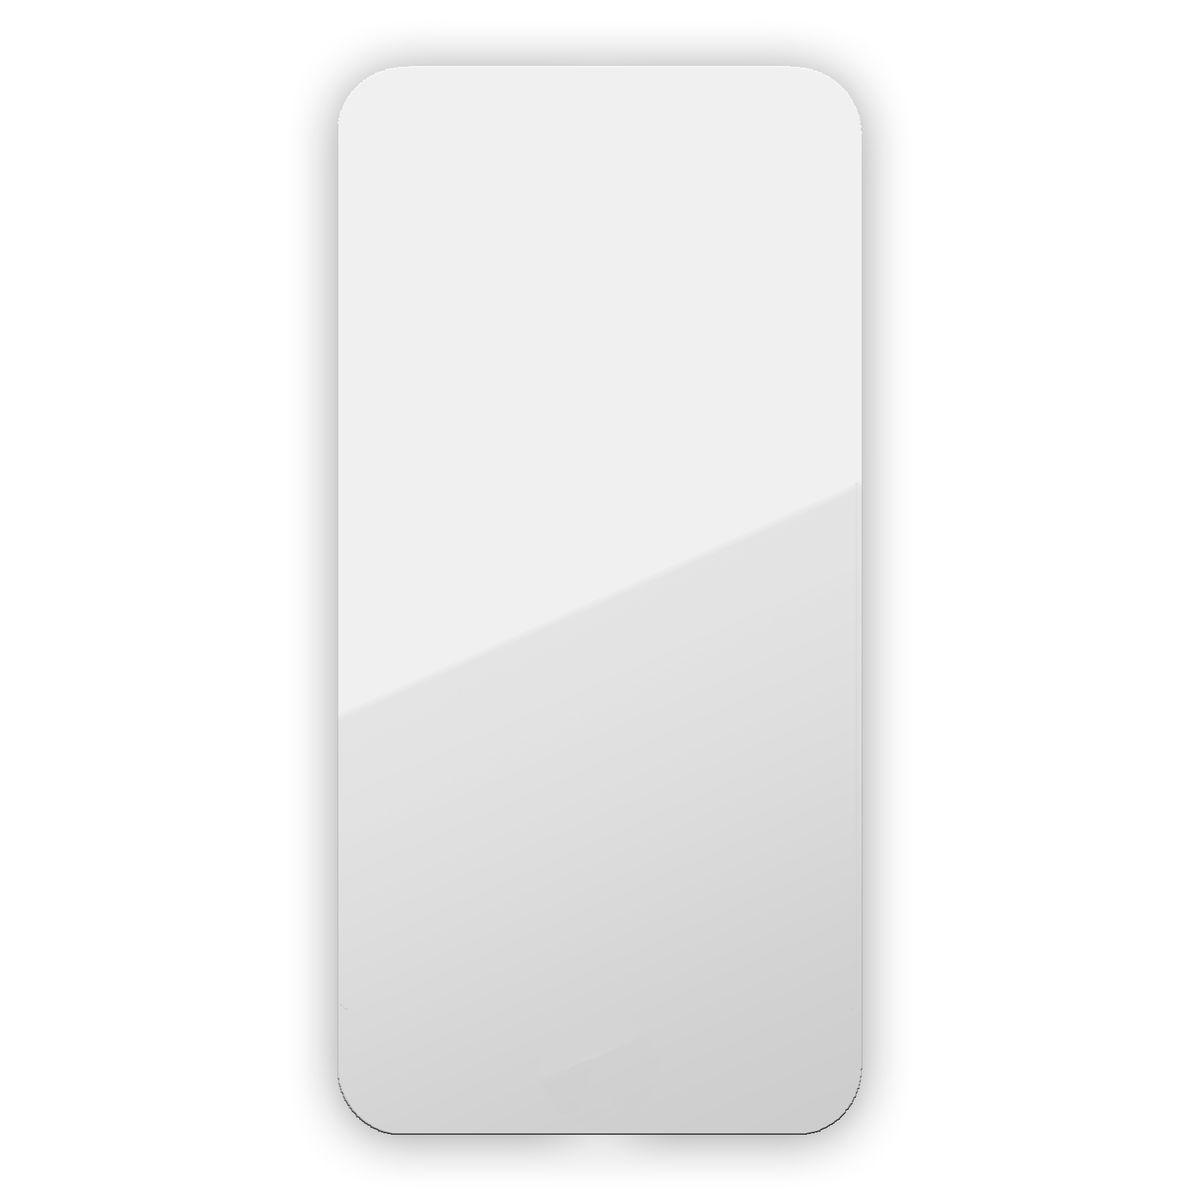 Защитное стекло Asus Zenfone Selfie, Raddisan, 0.33 мм, 2.5D